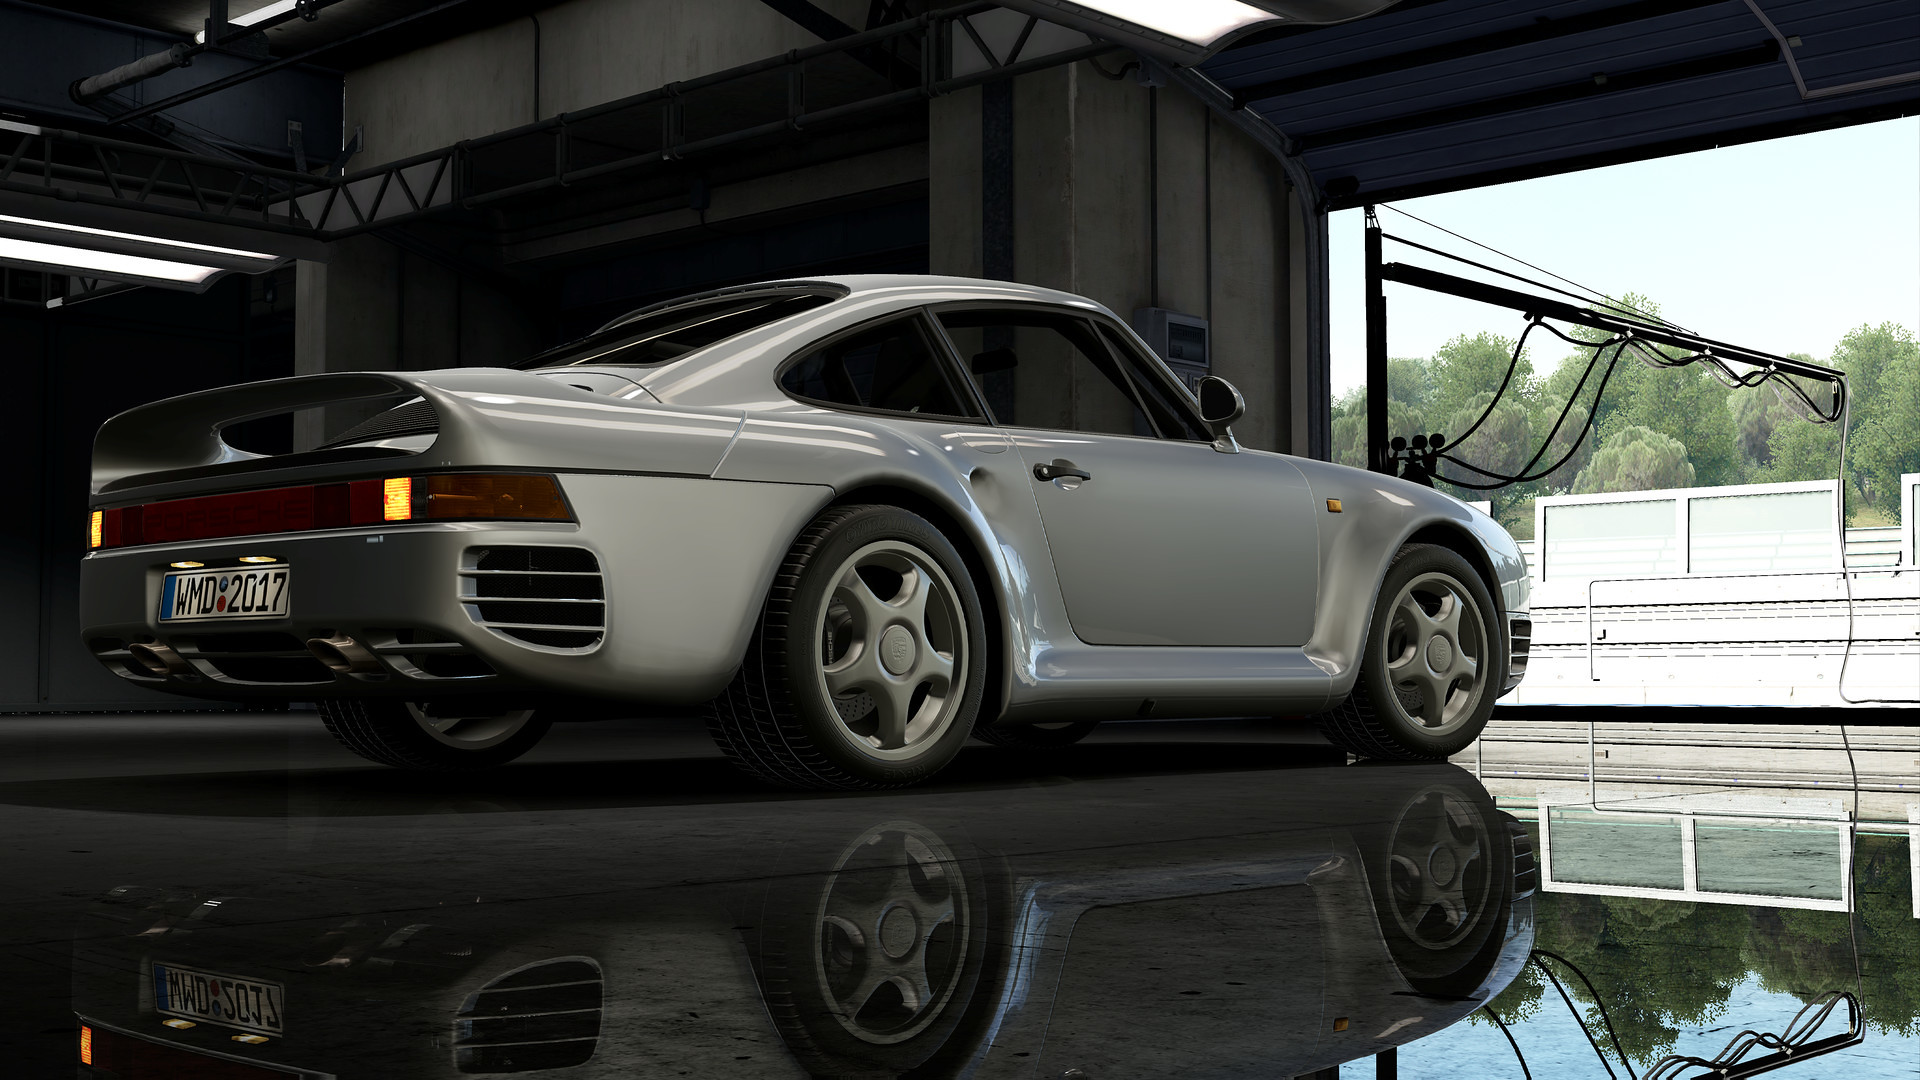 Project-CARS-2-Porsche-Legends-Pack-Porsche-959-S